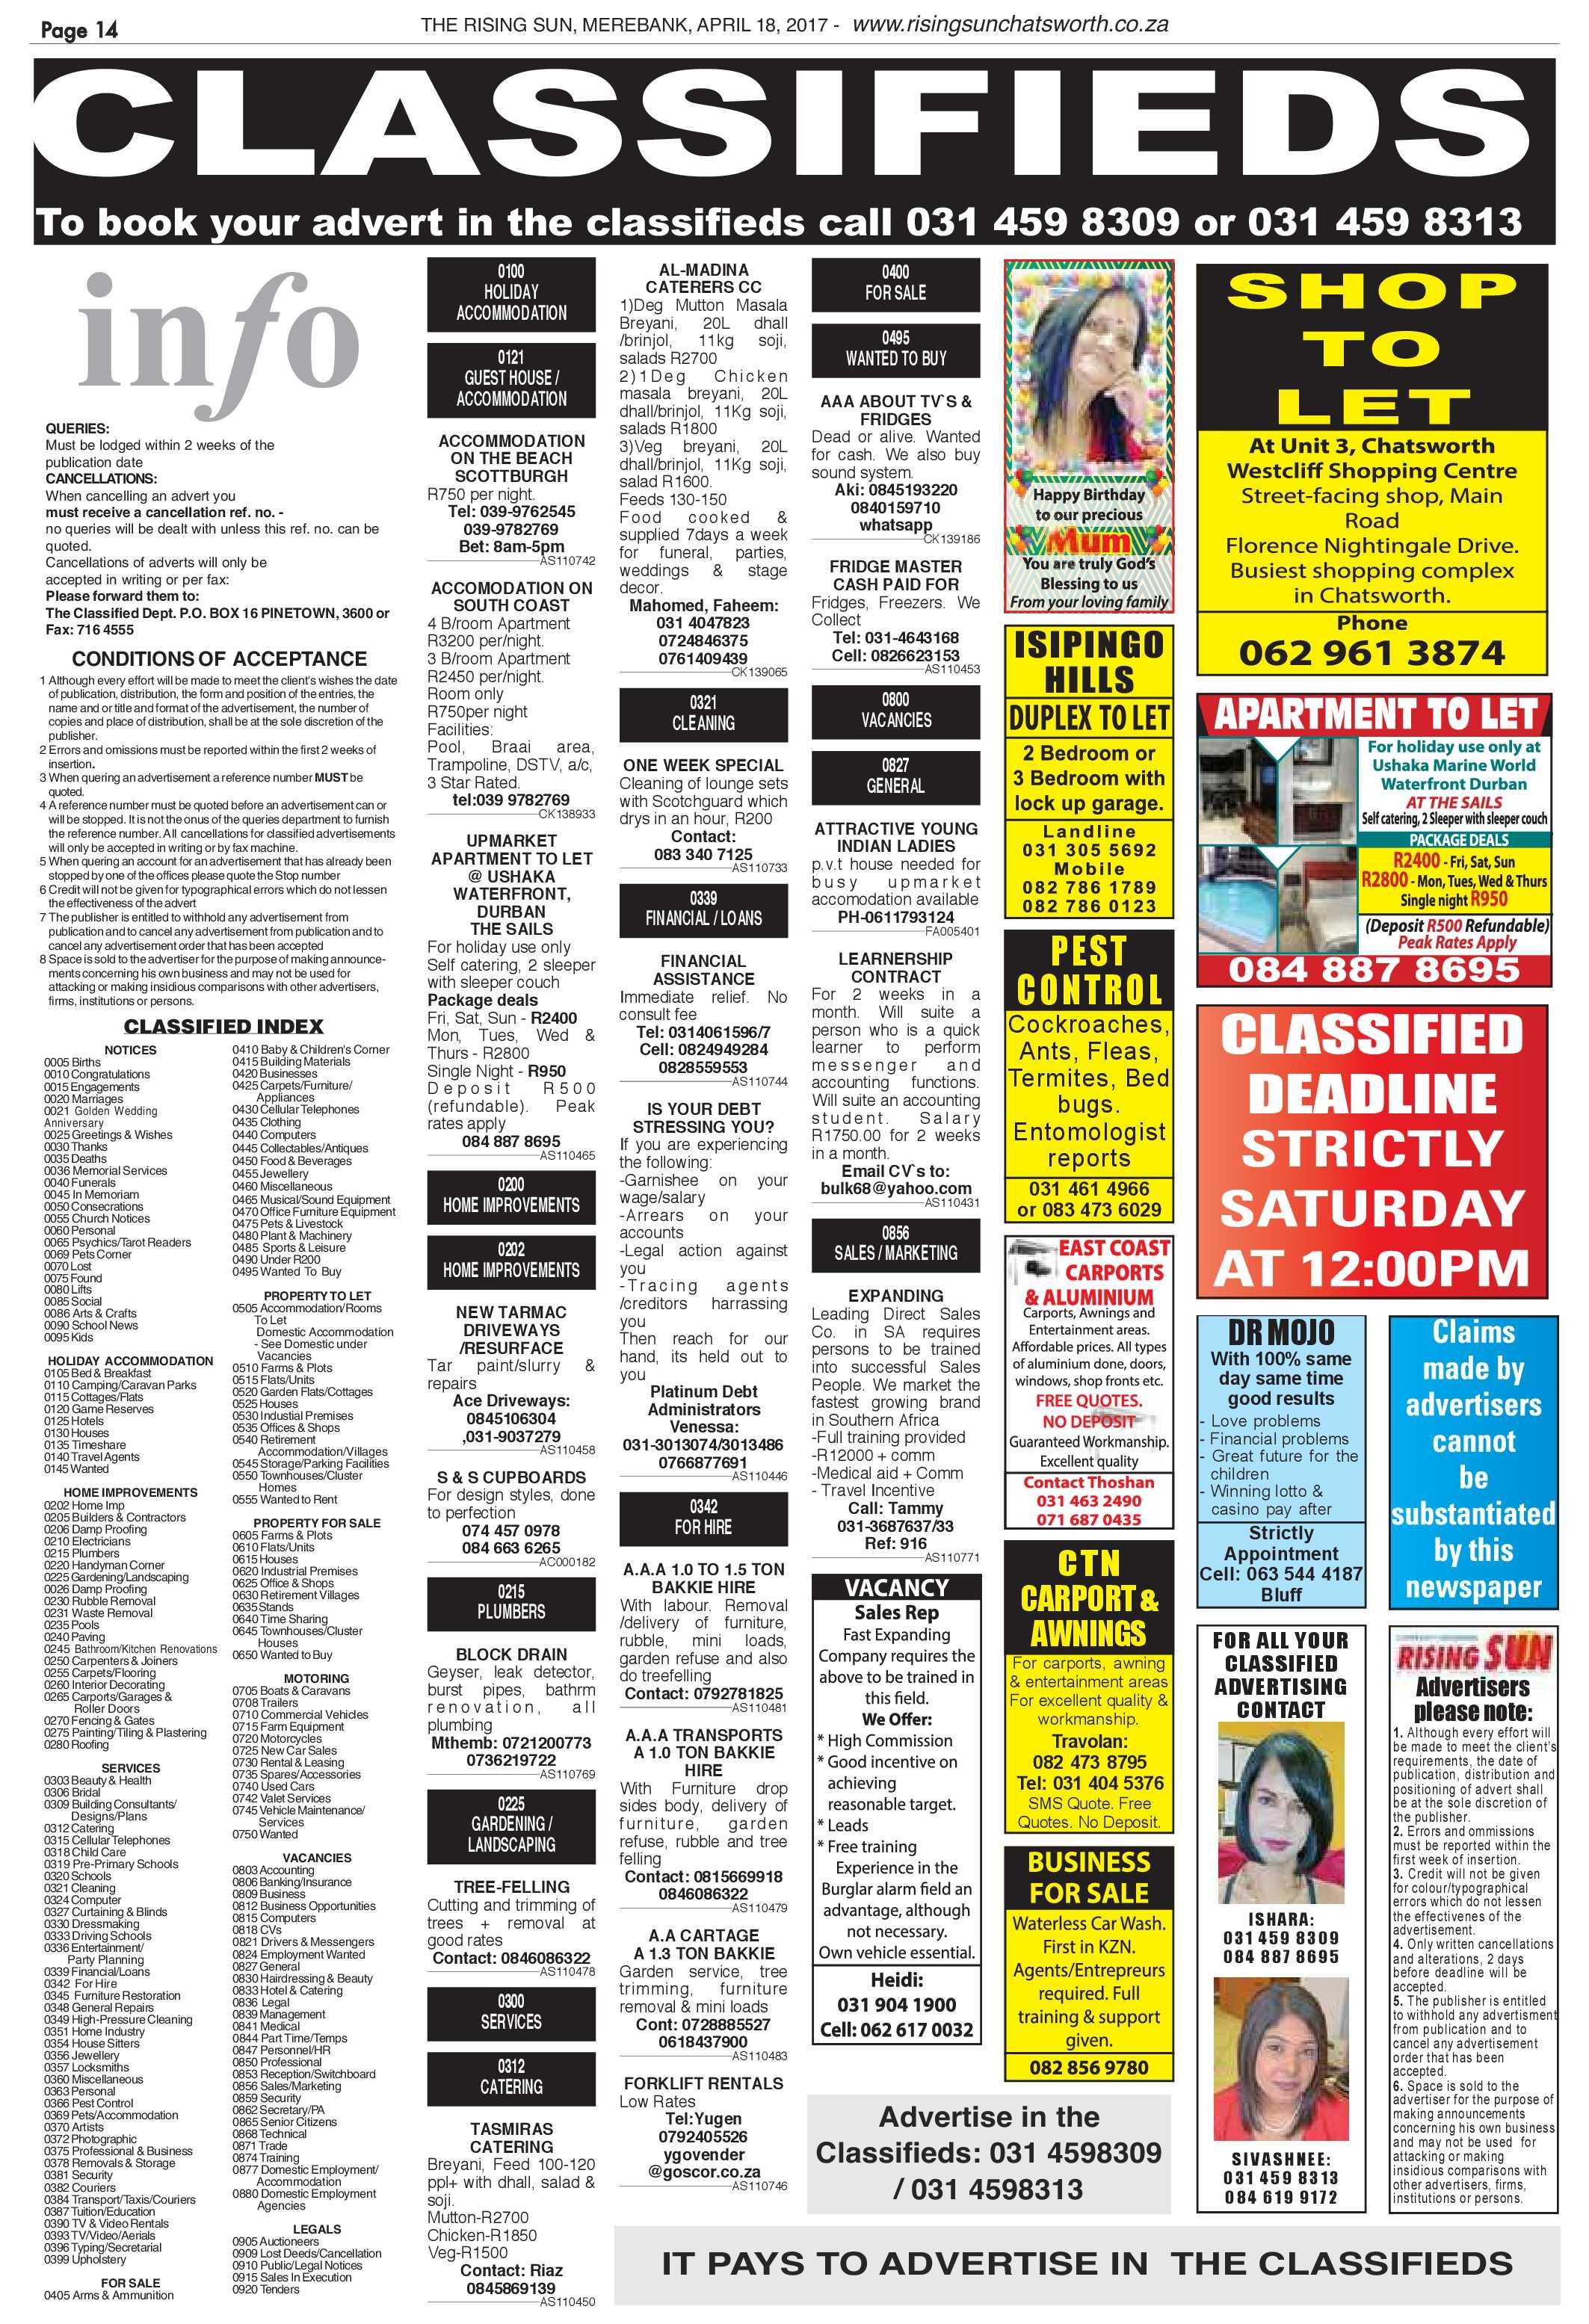 merebank-april-18-epapers-page-14